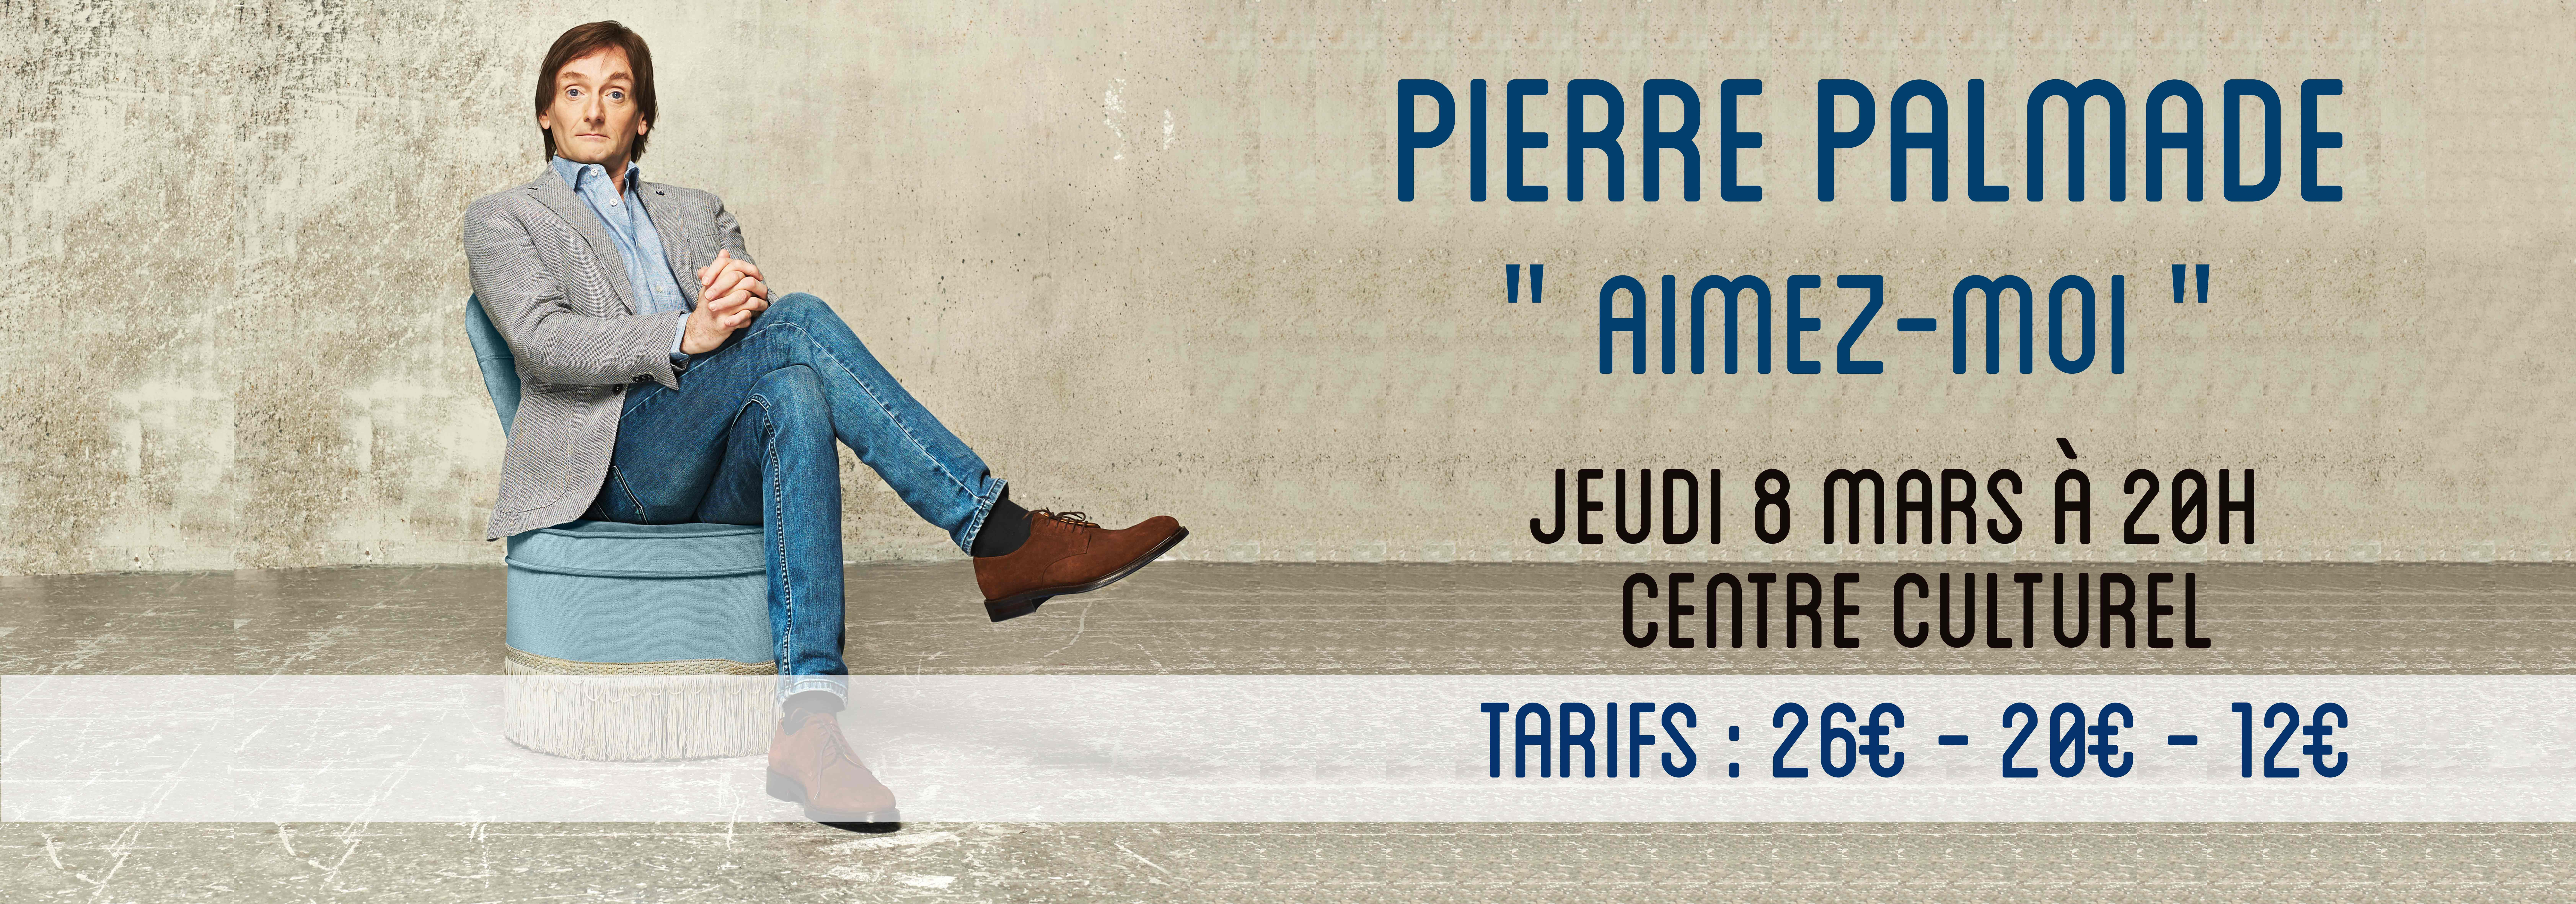 Pierre Palmade : «Aimez-moi»